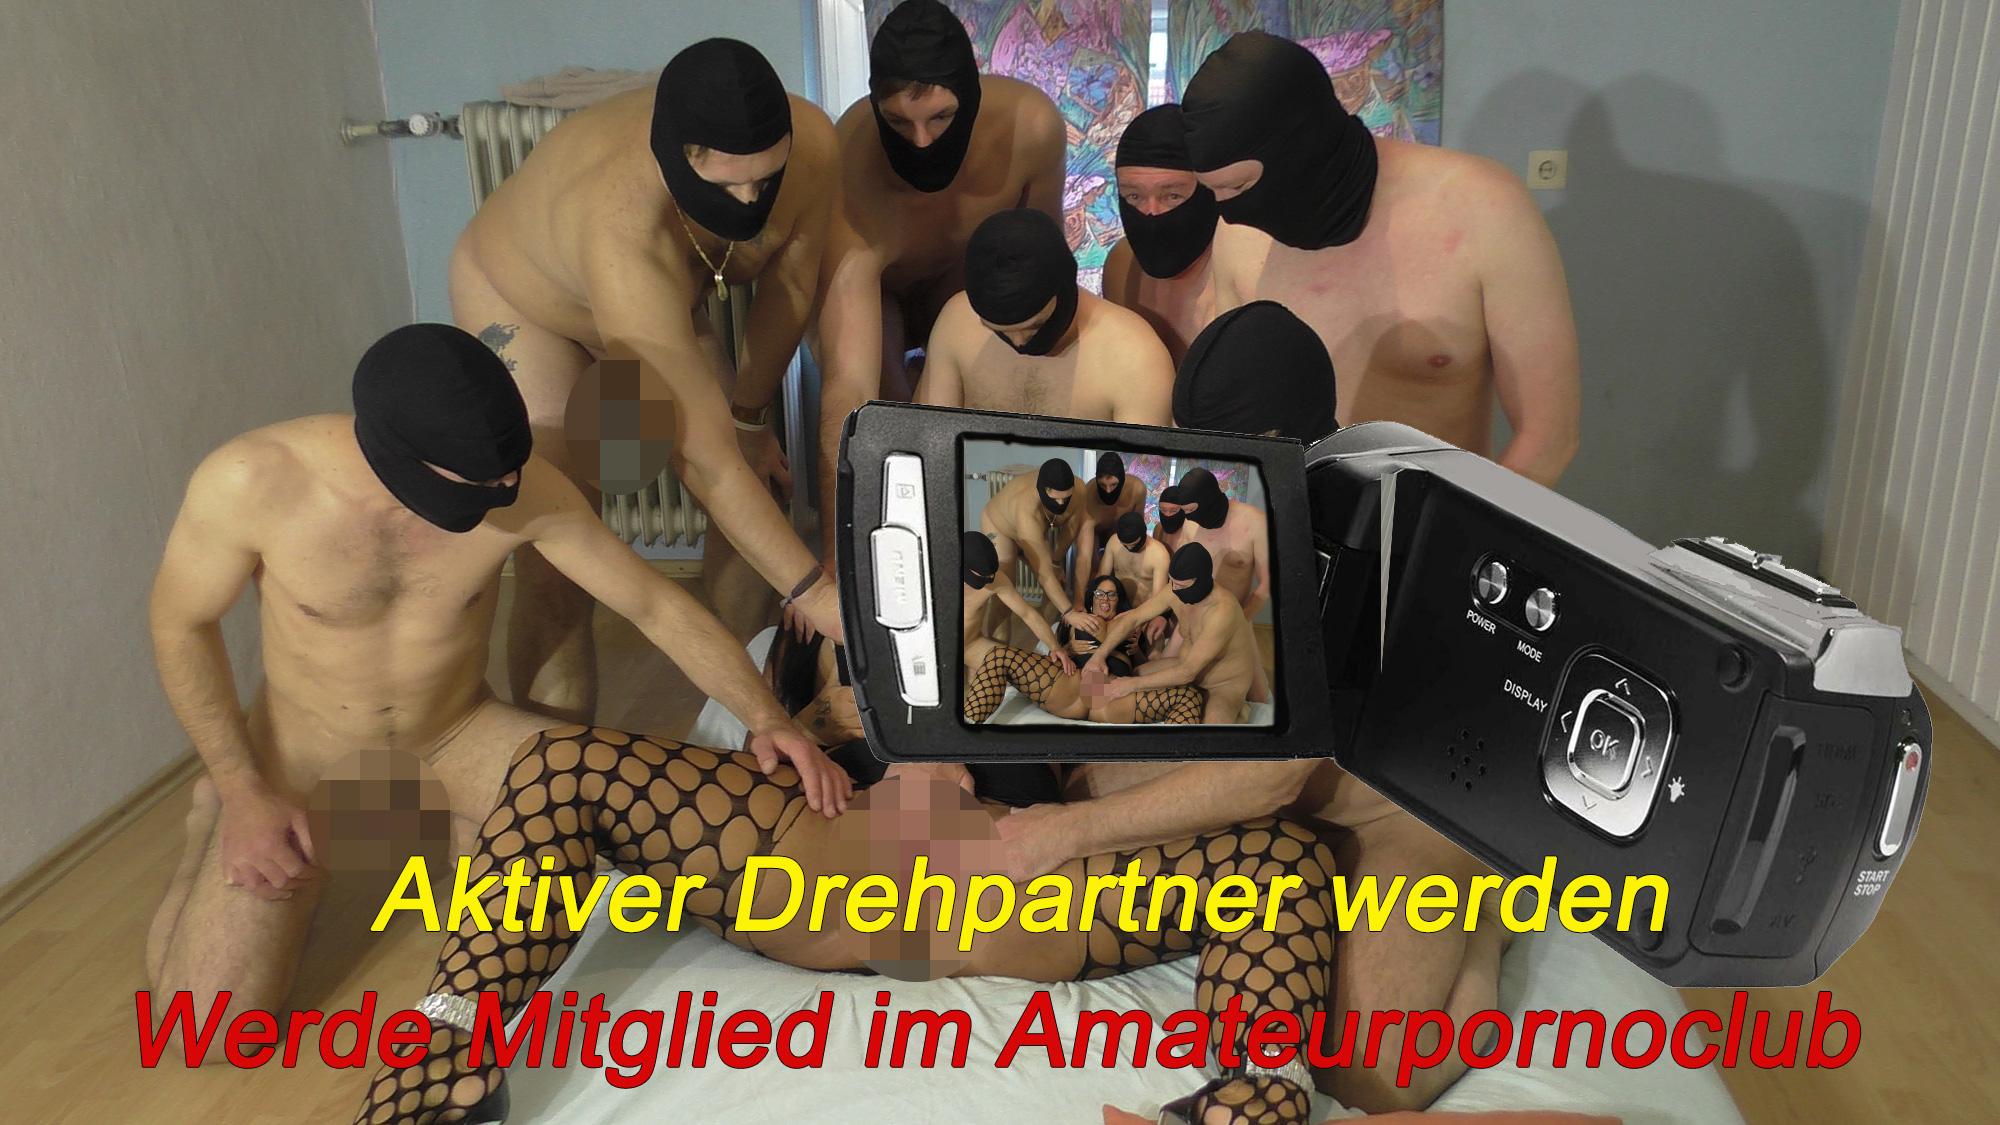 https://amateurpornoclub.net/Banner/gruppenbild-Cam.jpg